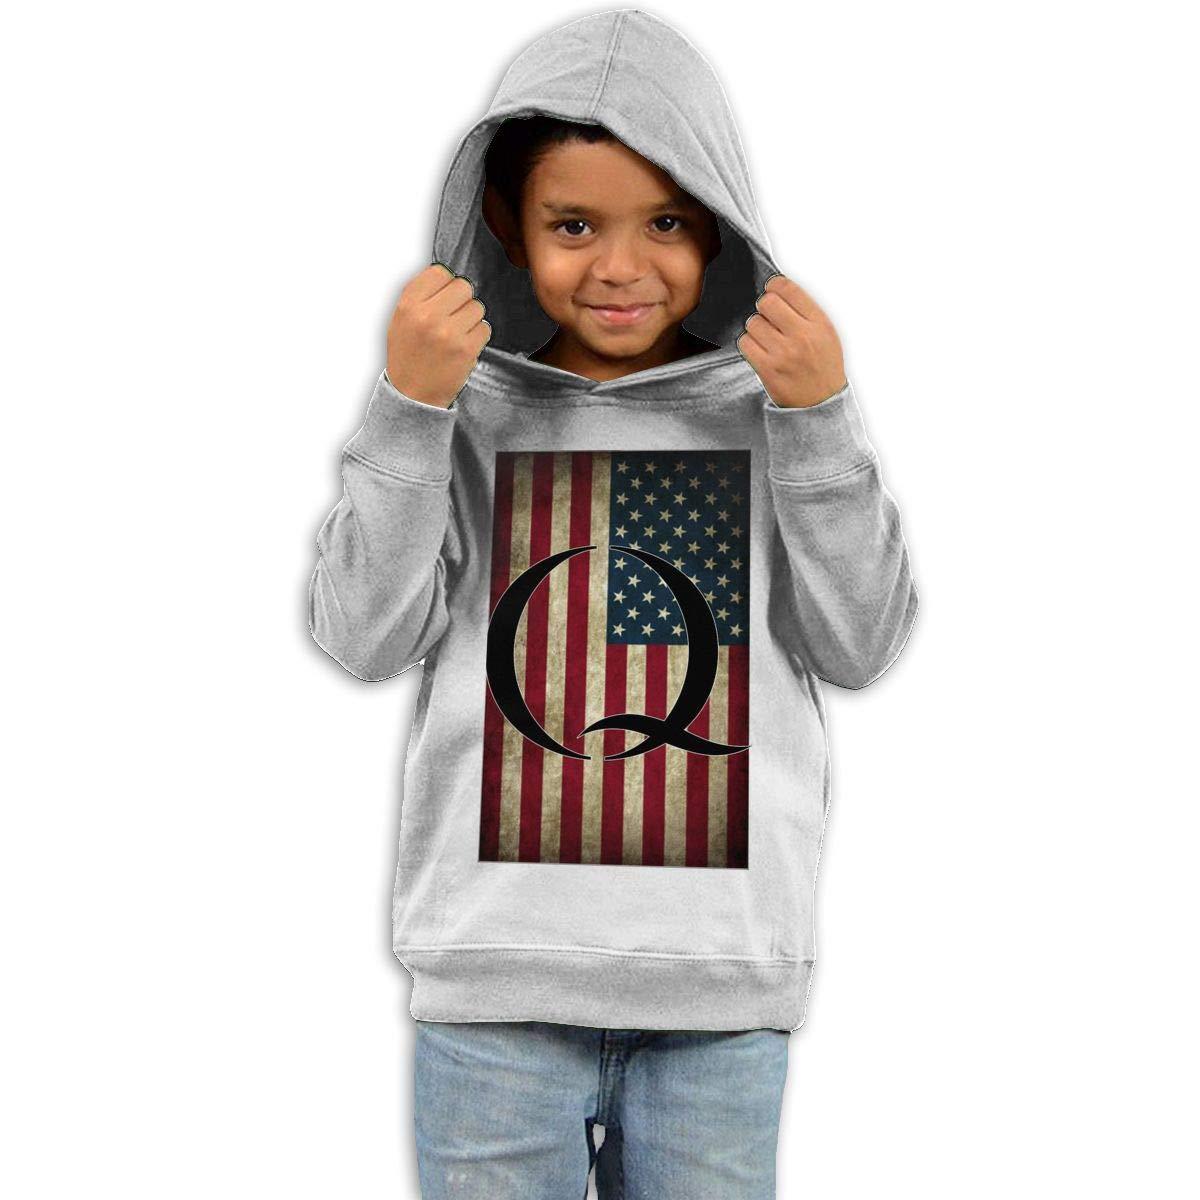 Stacy J. Payne Toddler QAnon Freedom Movement Q Anon White Rabbit Fashion 41 White